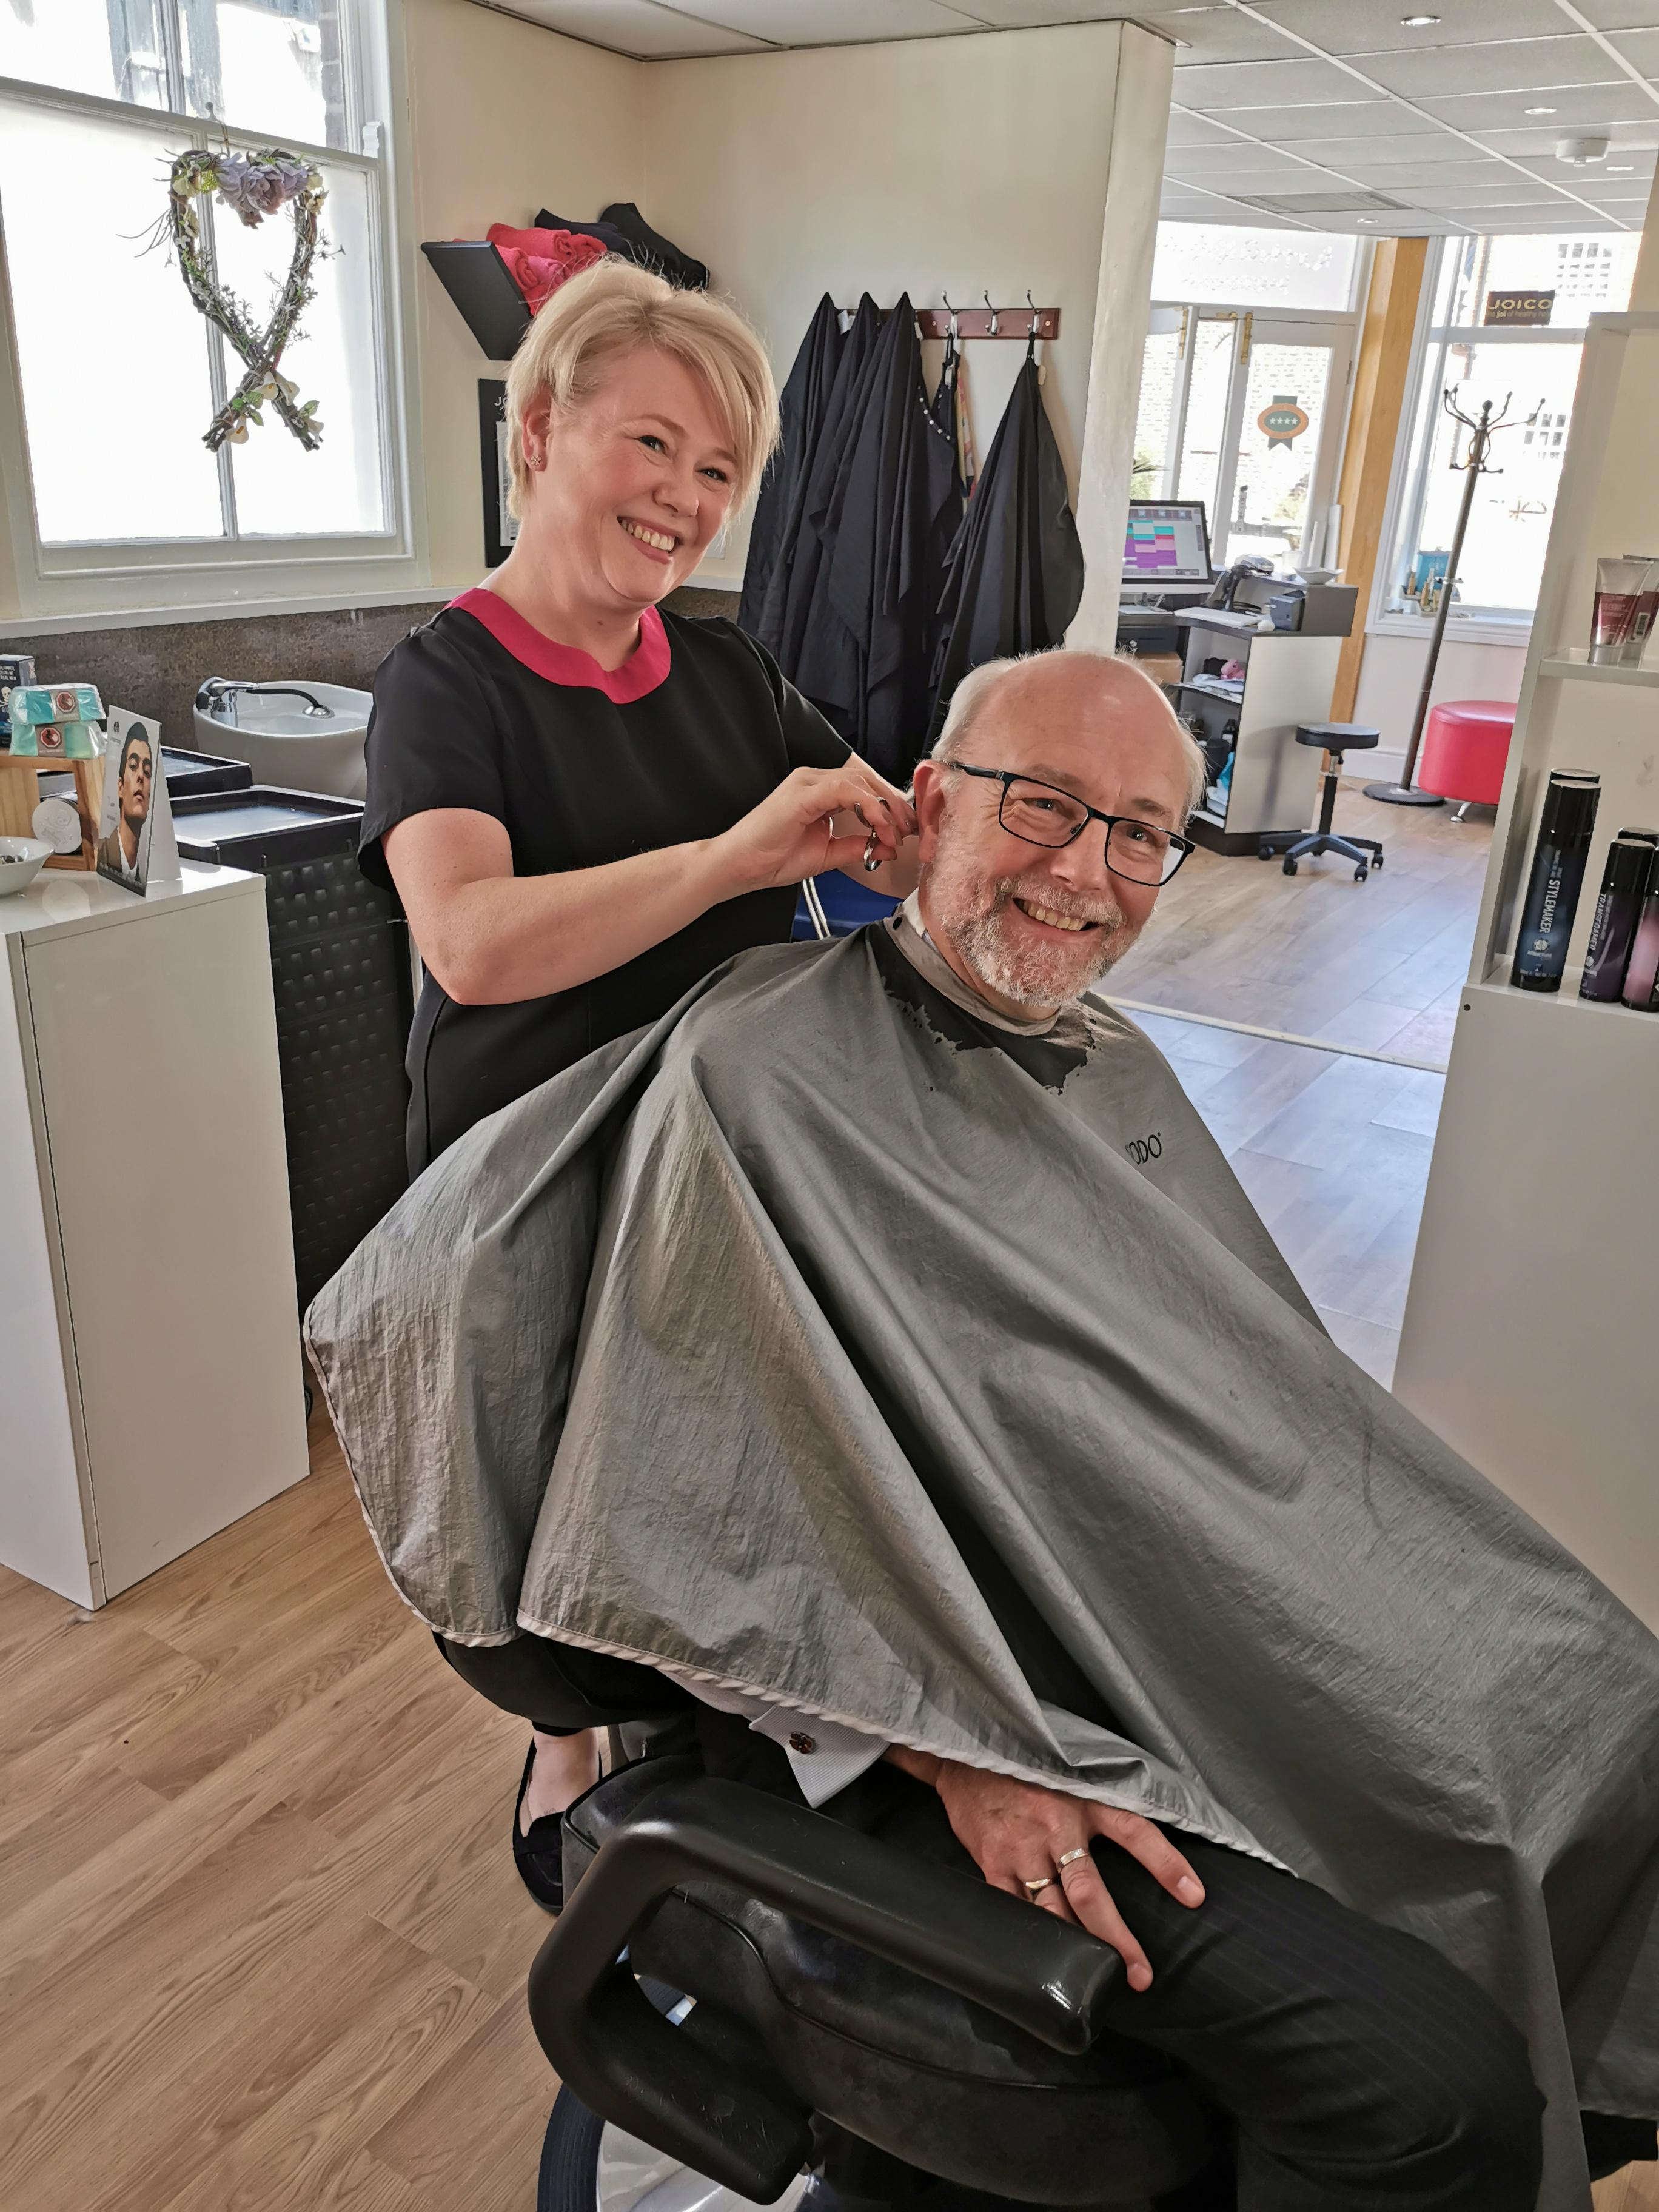 Alex praises community spirit of local hairdressers